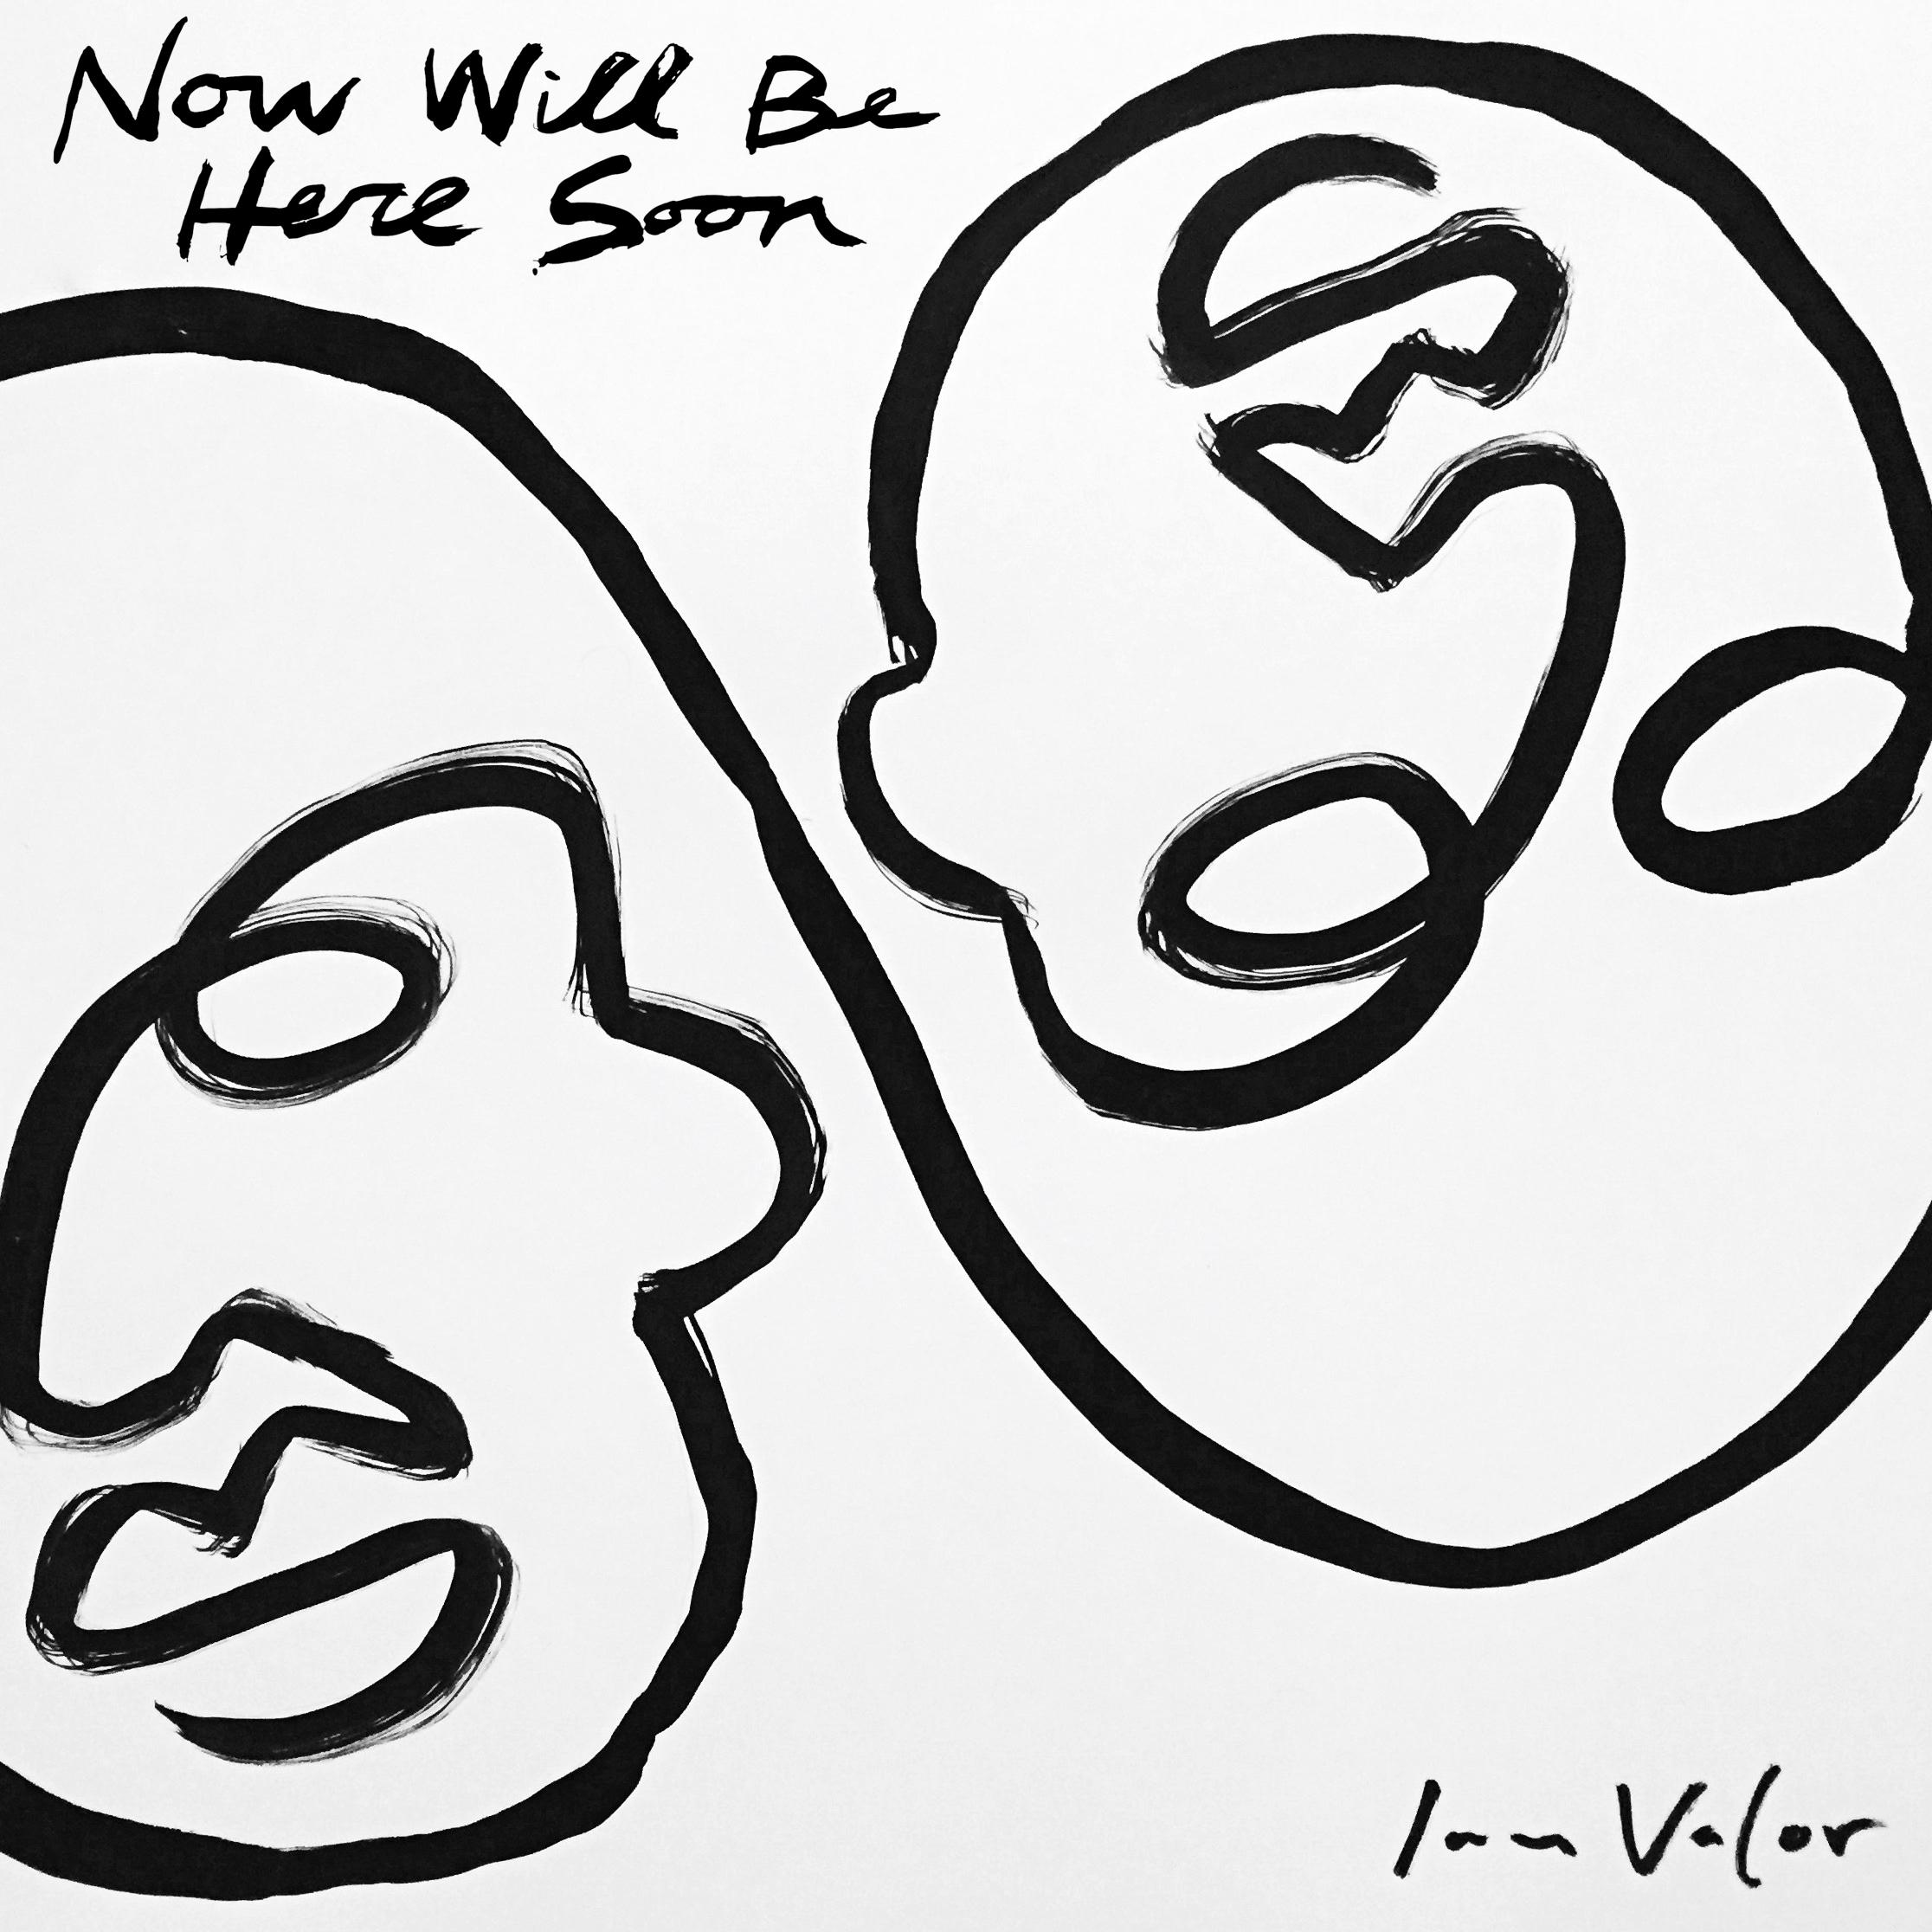 Now-Will-Be-Here-Soon-Ian-Valor.jpg